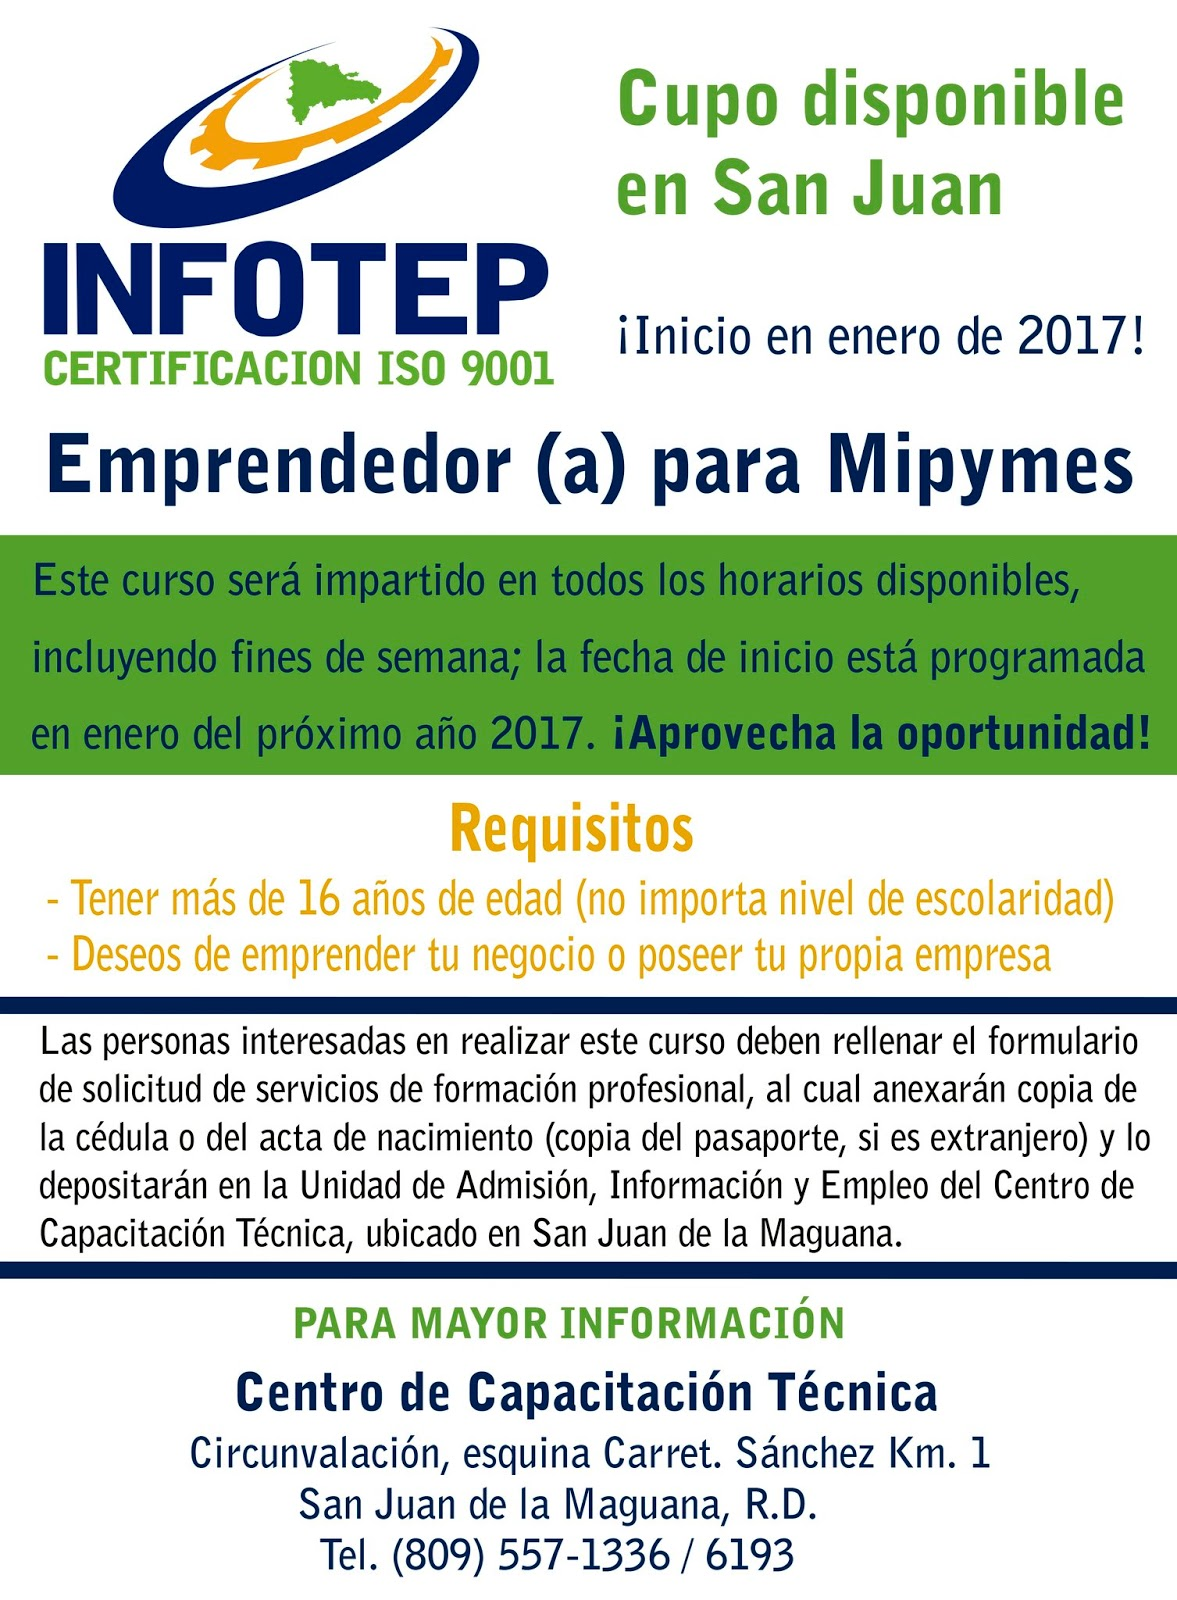 CURSO DE INFOTEP : EMPRENDEDOR PARA MIPYMES – Ven Infórmate